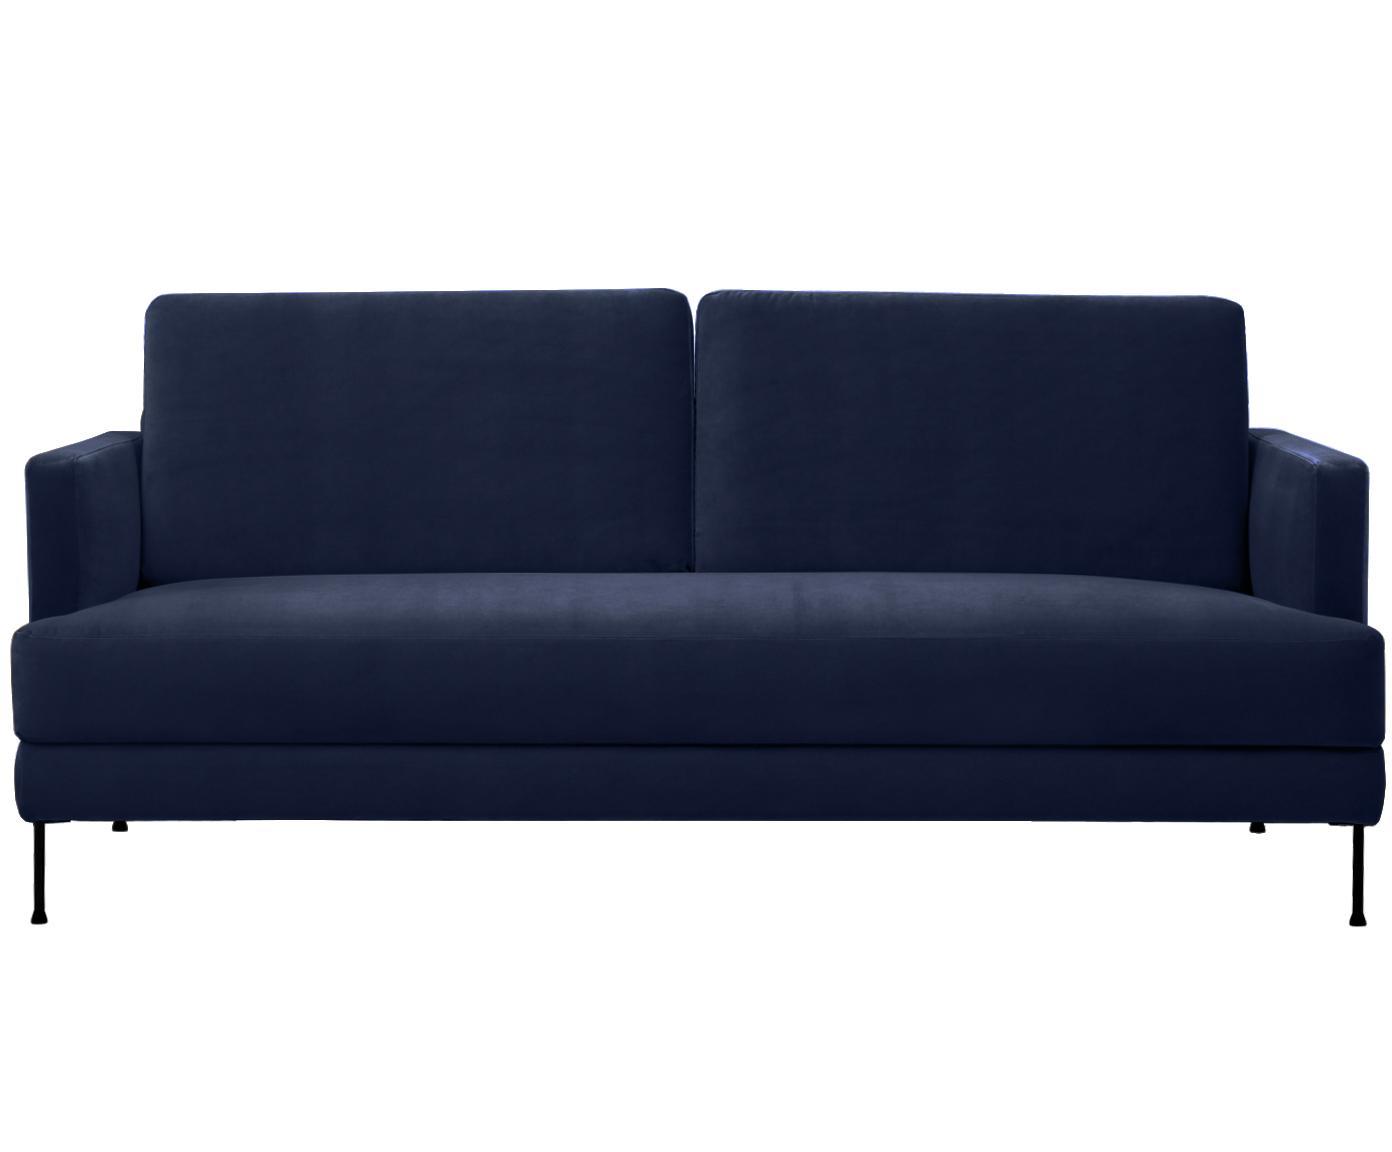 Samt-Sofa Fluente (3-Sitzer), Bezug: Samt (Hochwertiger Polyes, Gestell: Massives Kiefernholz, Füße: Metall, lackiert, Samt Dunkelblau, B 197 x T 83 cm